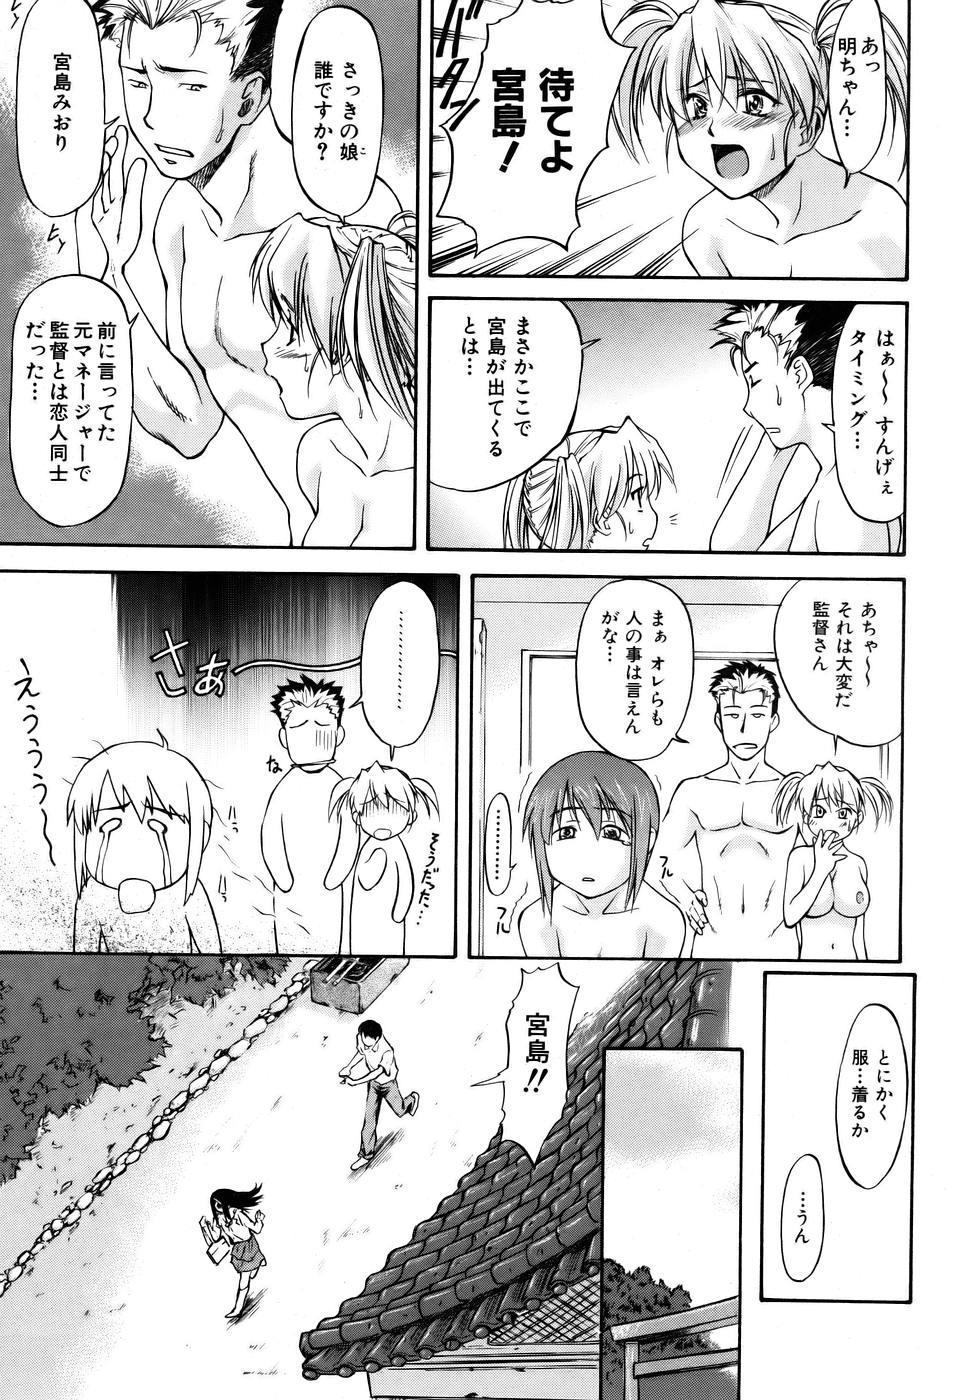 COMIC AUN 2005-12 Vol. 115 38